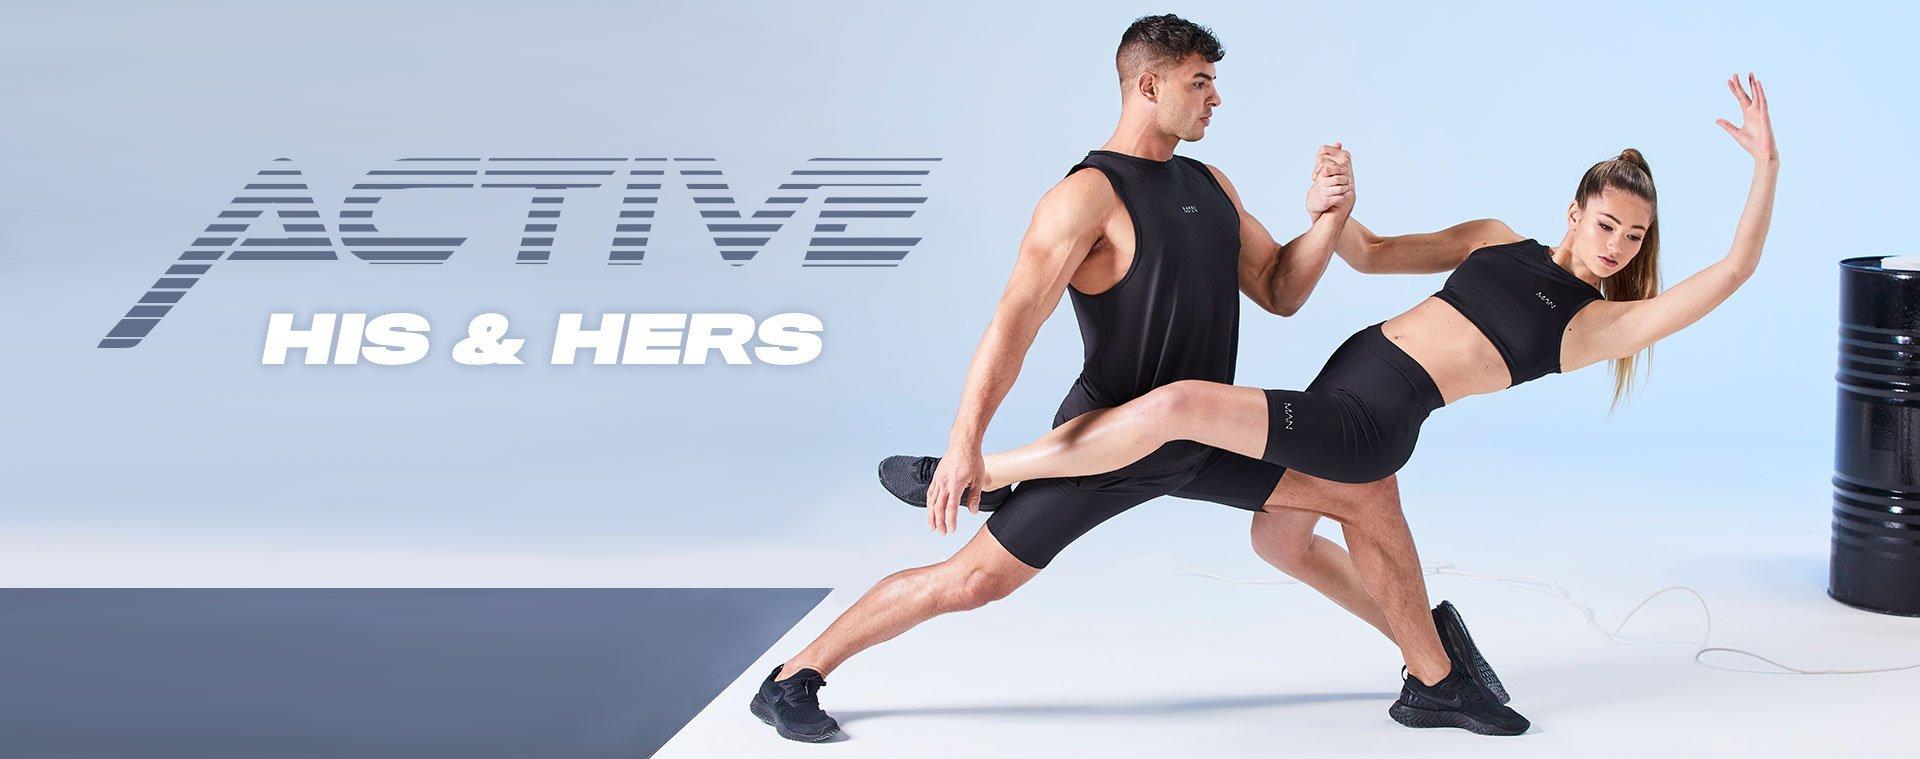 His & Hers Activewear